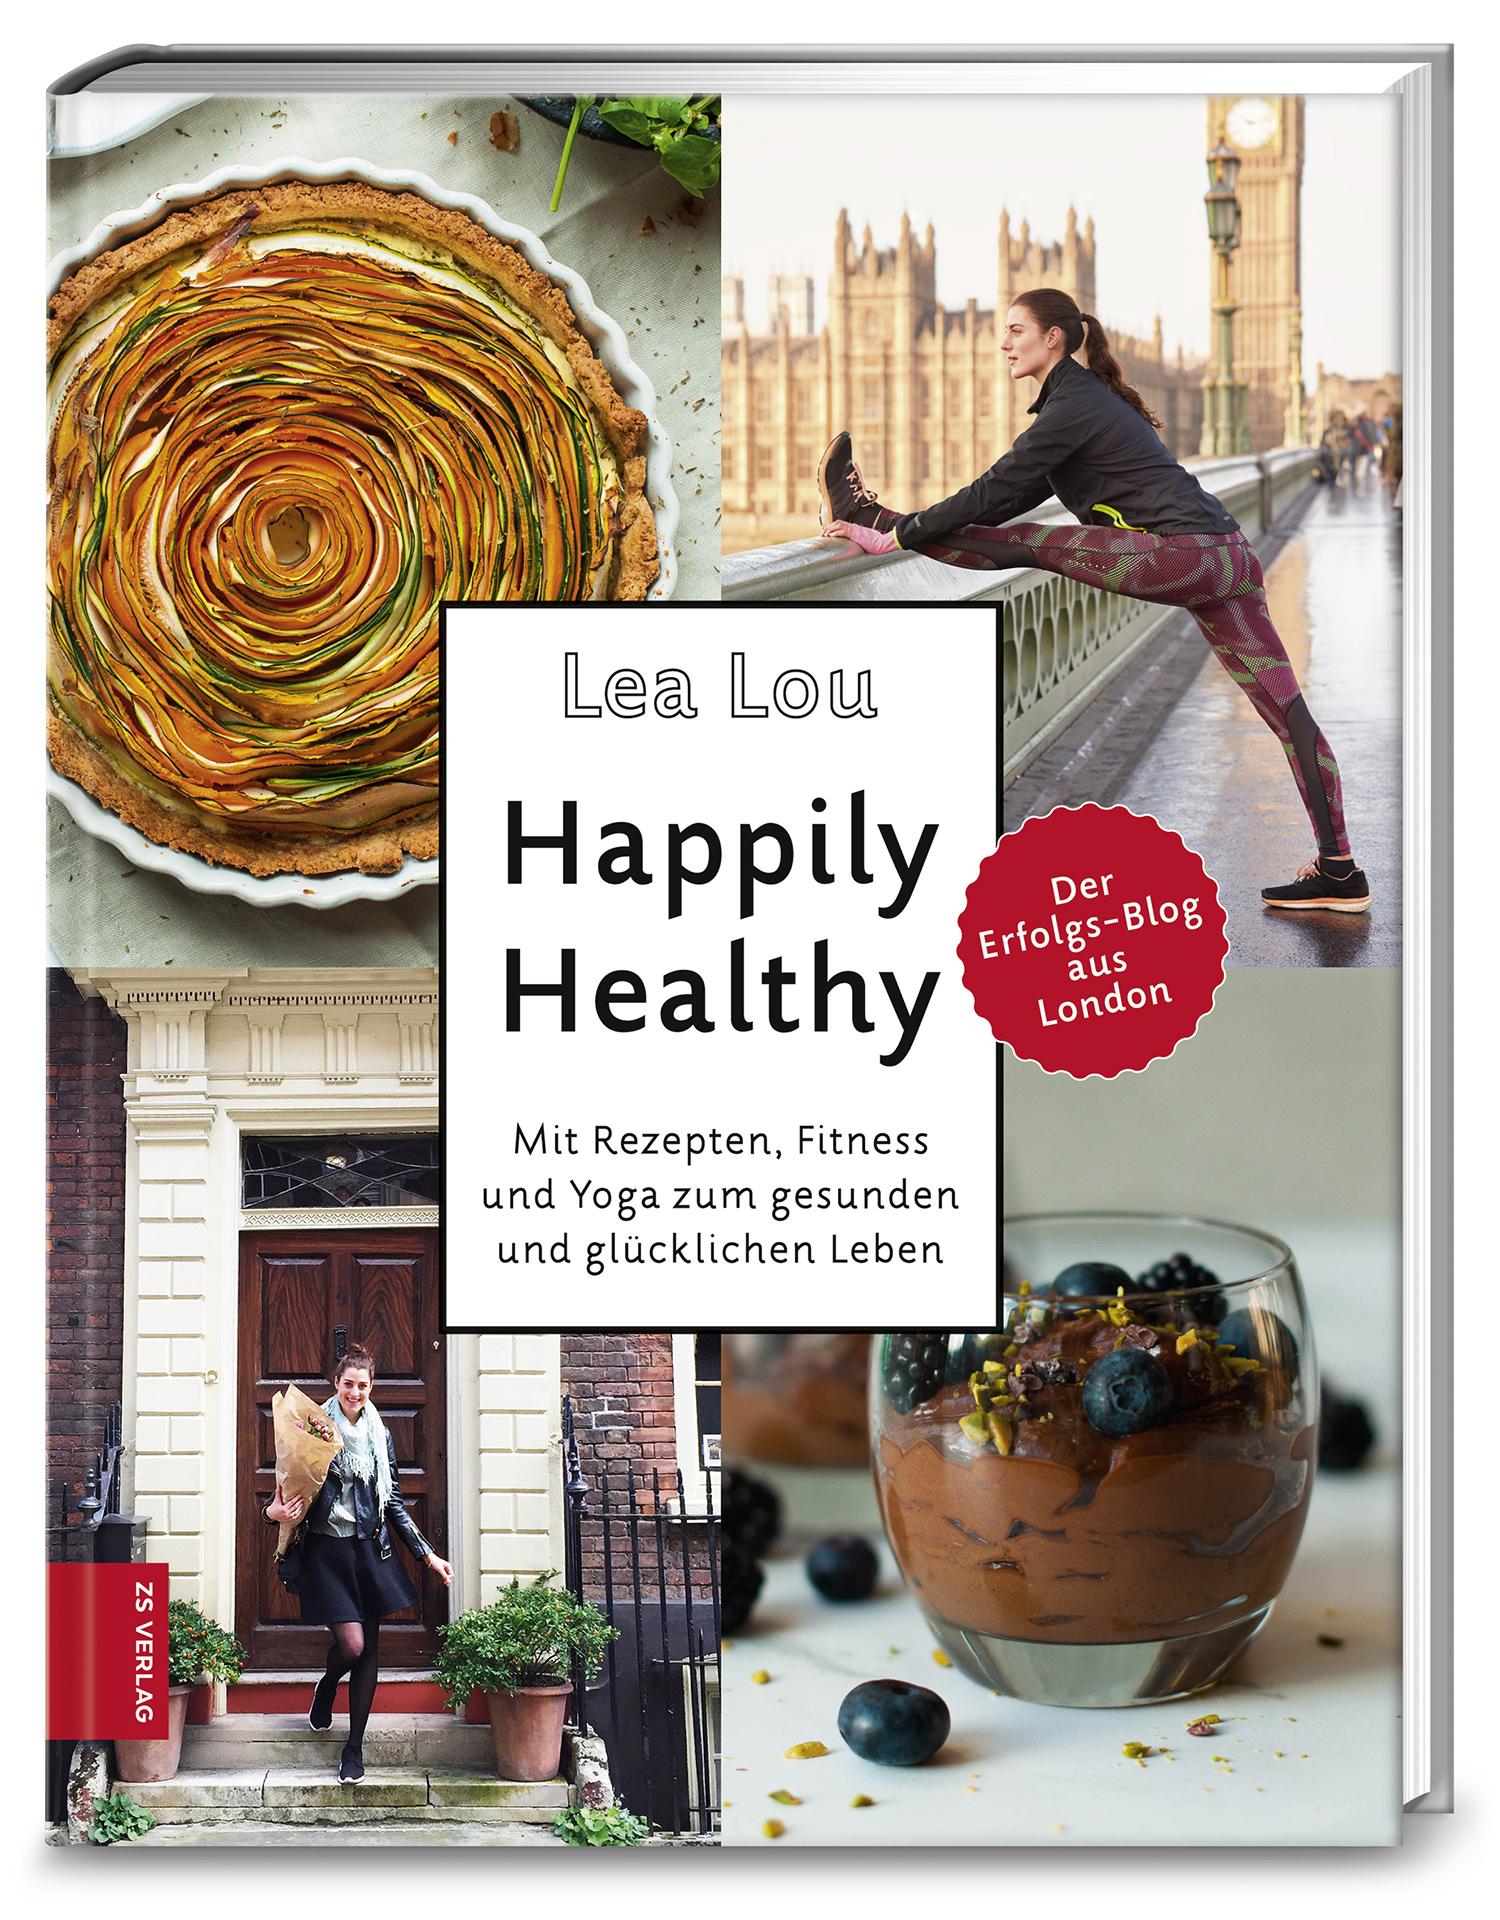 Lea-Lou-Happily-Healthy-Mock-Up-web